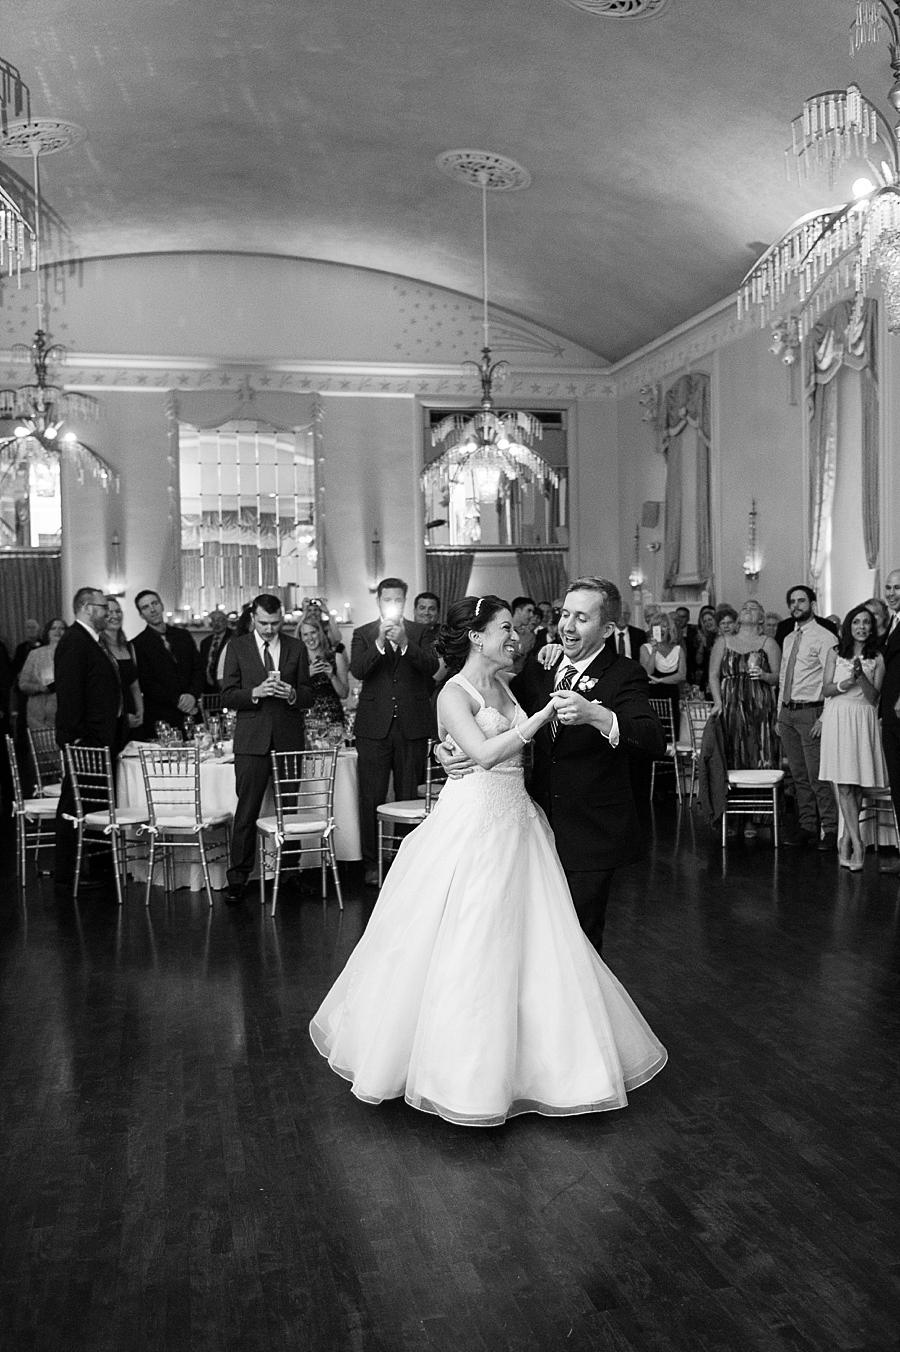 New_Haven_Lawn_Club_Wedding_Edgerton_Park_47.jpg